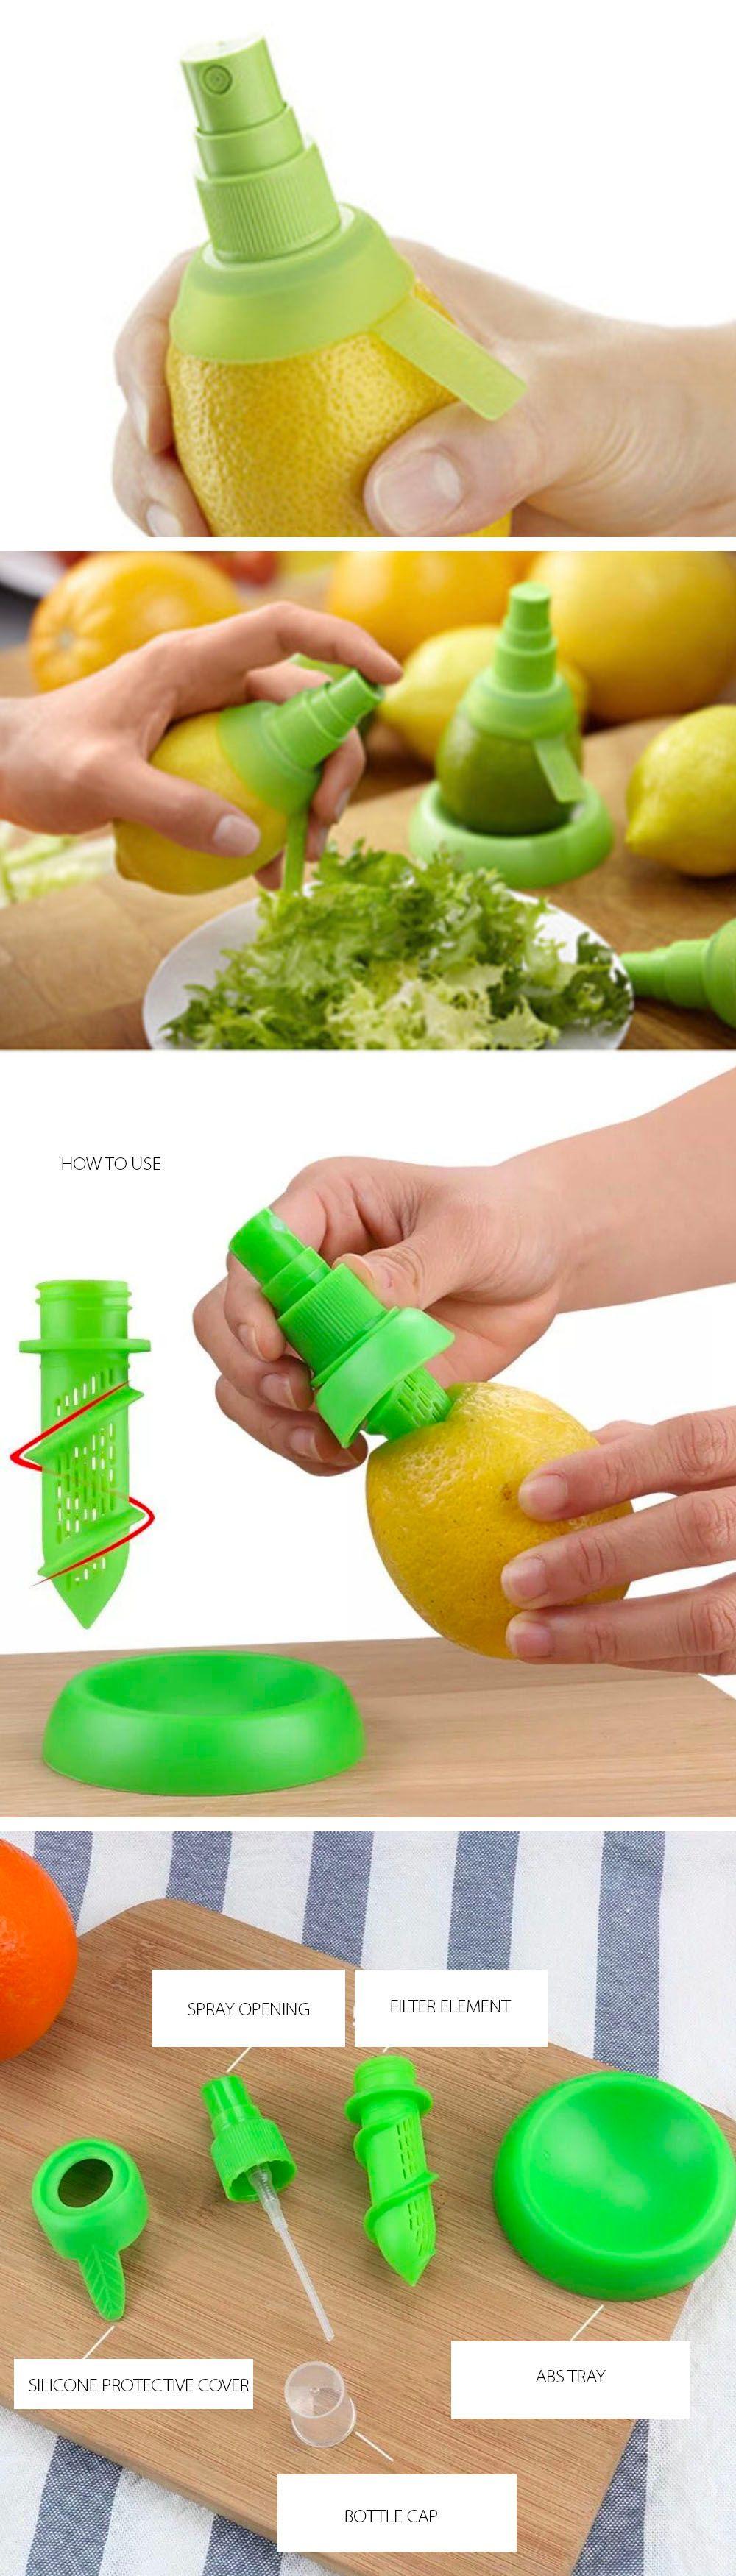 Lemon Spayer Easy To Use